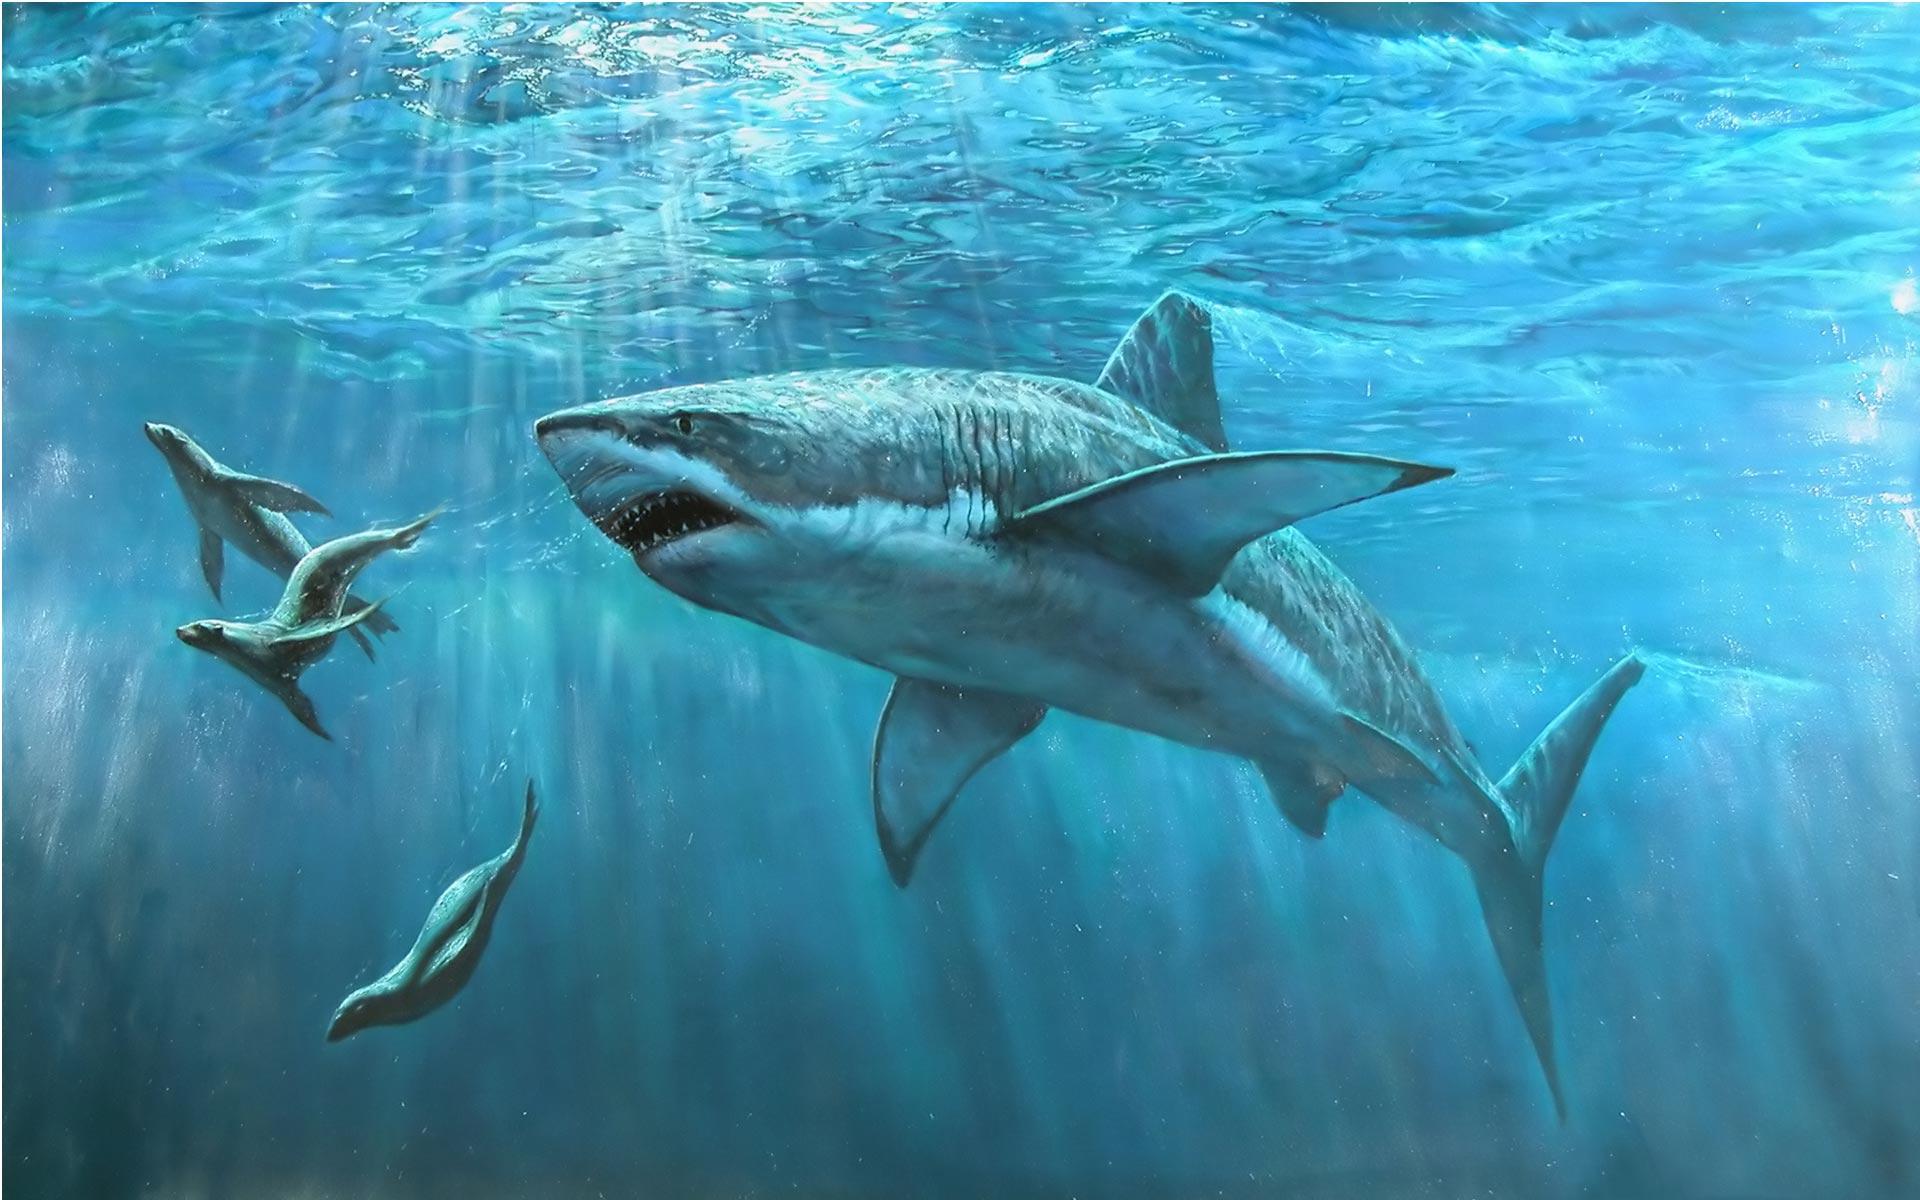 download Shark hunting pc hd Wallpaper High Quality 1920x1200